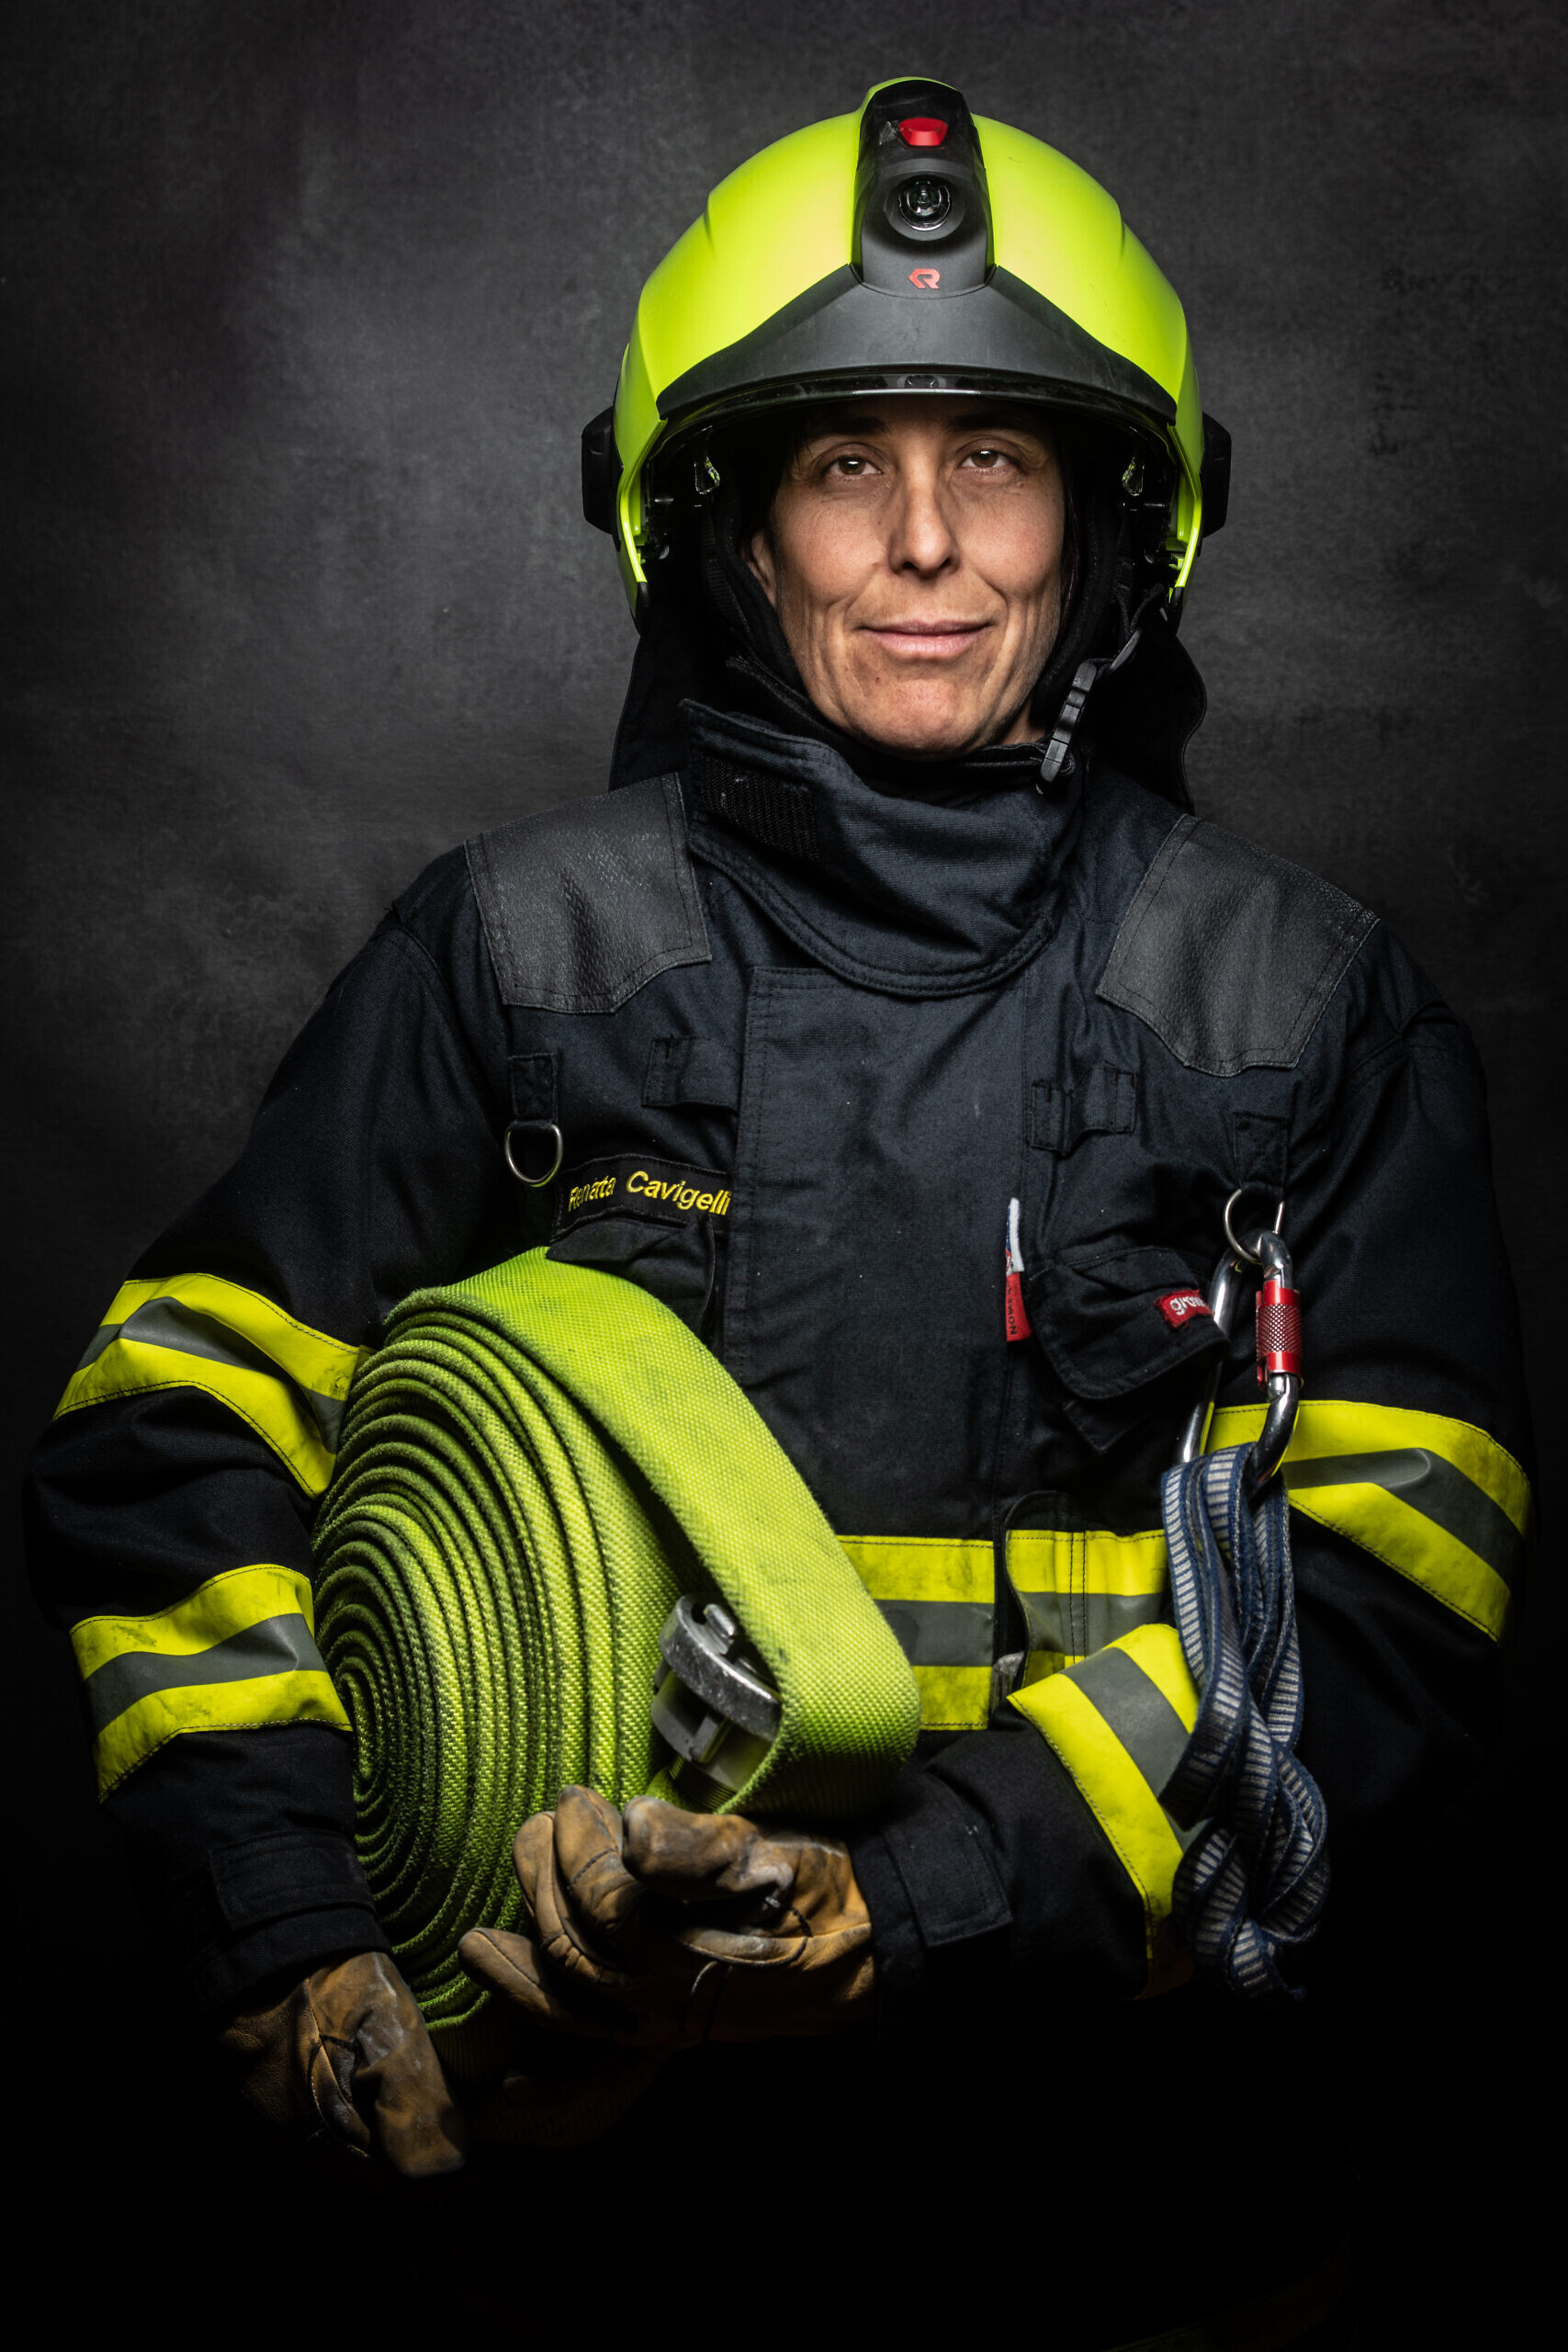 Feuerwehrfrau Feuerwehr Chur. Foto: Mattias Nutt